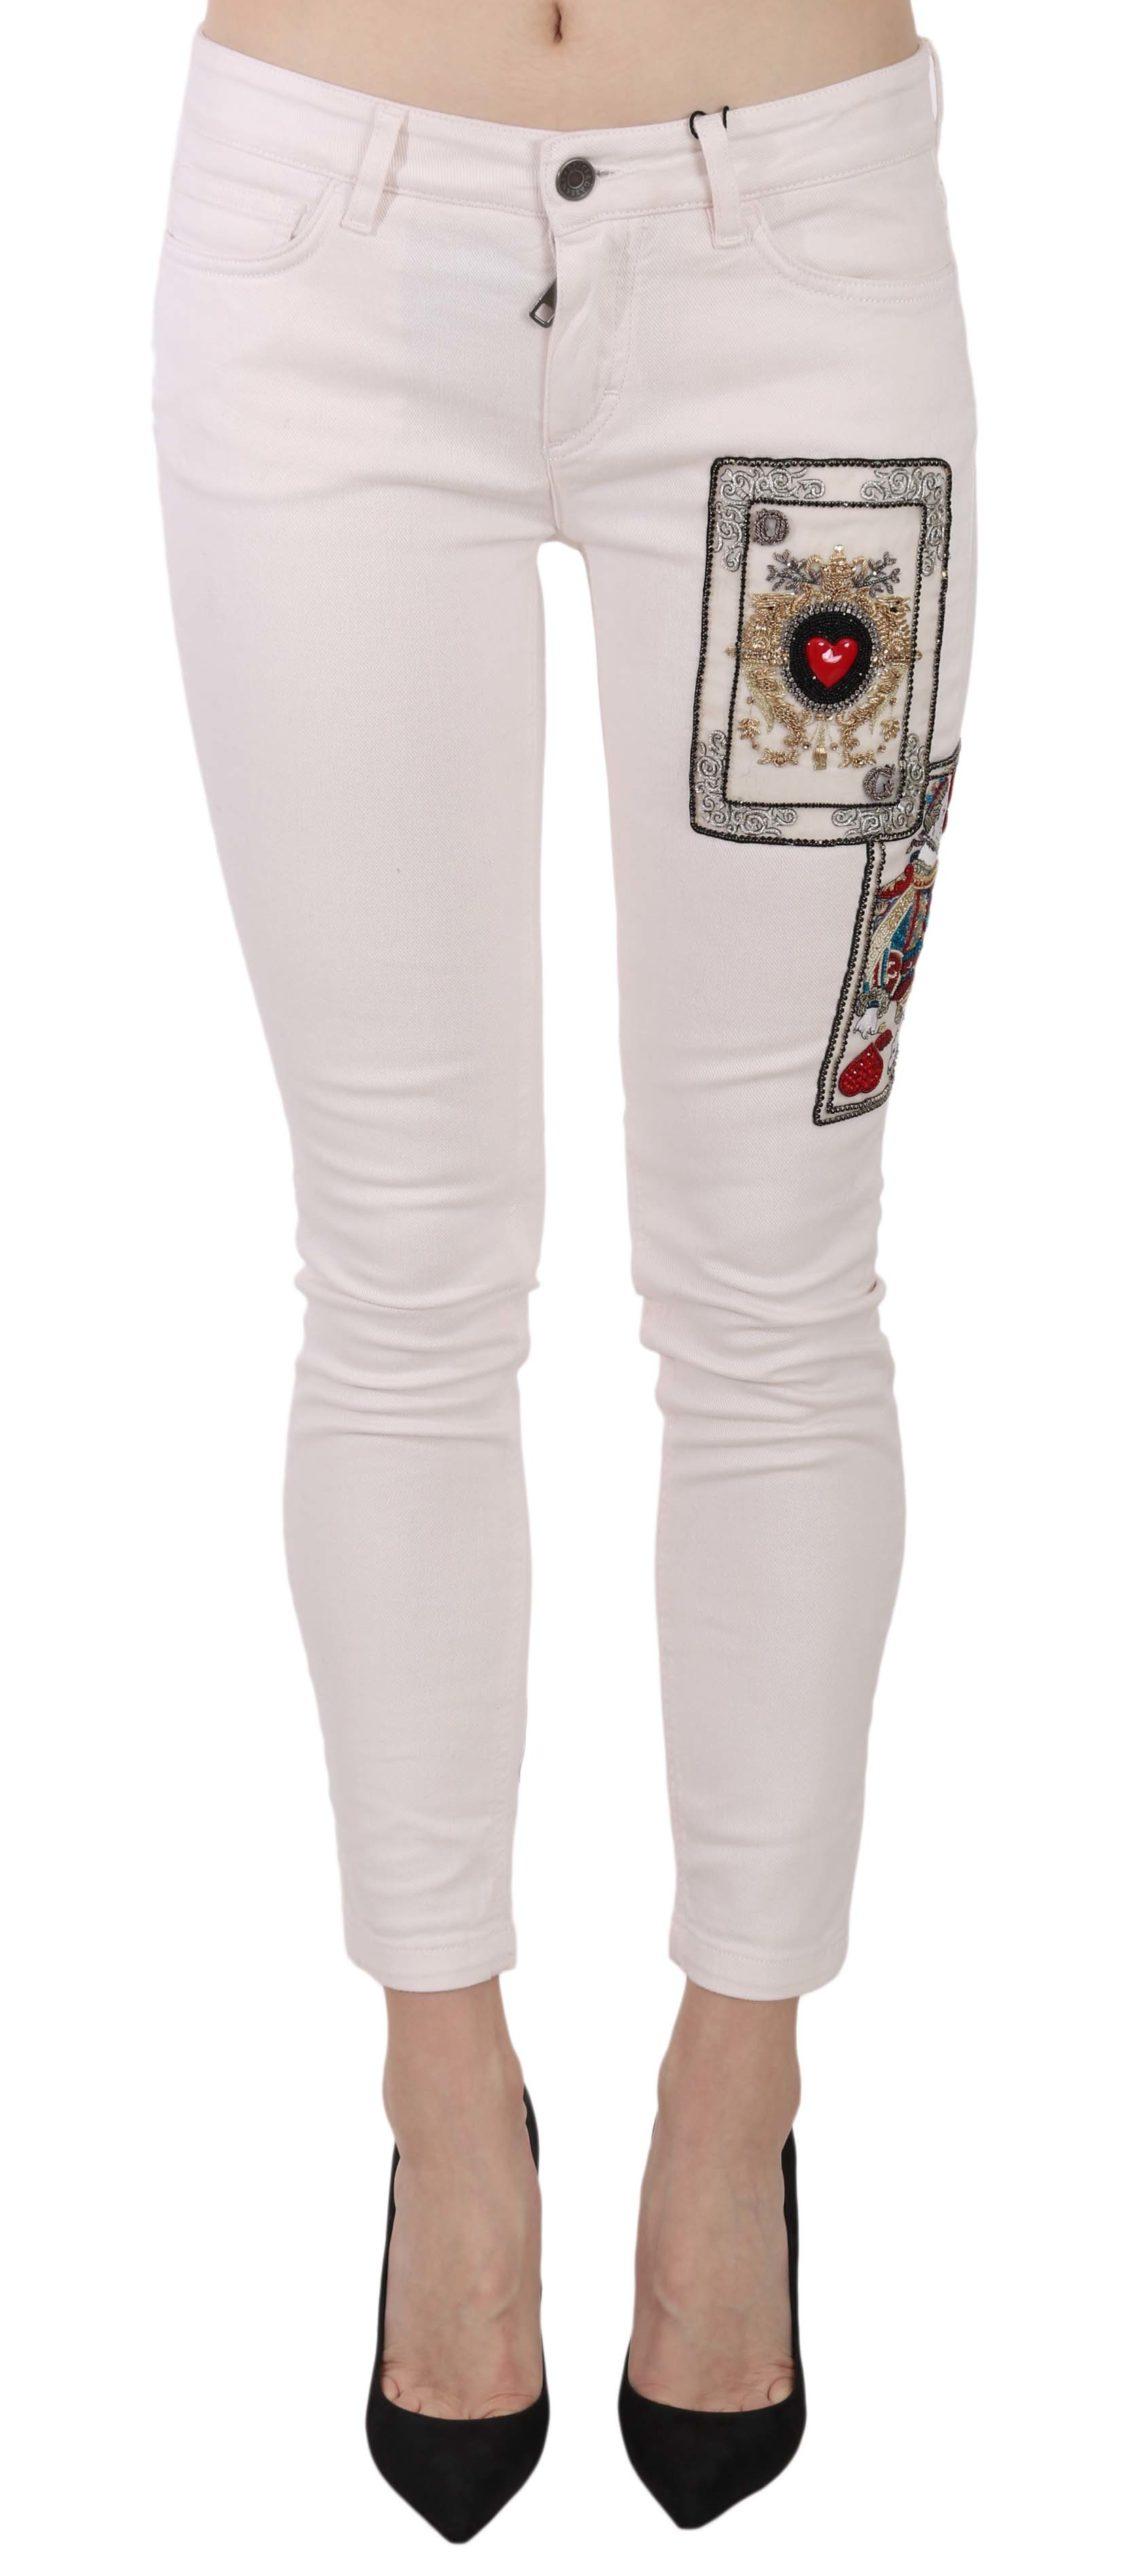 Dolce & Gabbana Women's Queen Of Hearts Skinny Jeans White PAN61199 - IT40|S